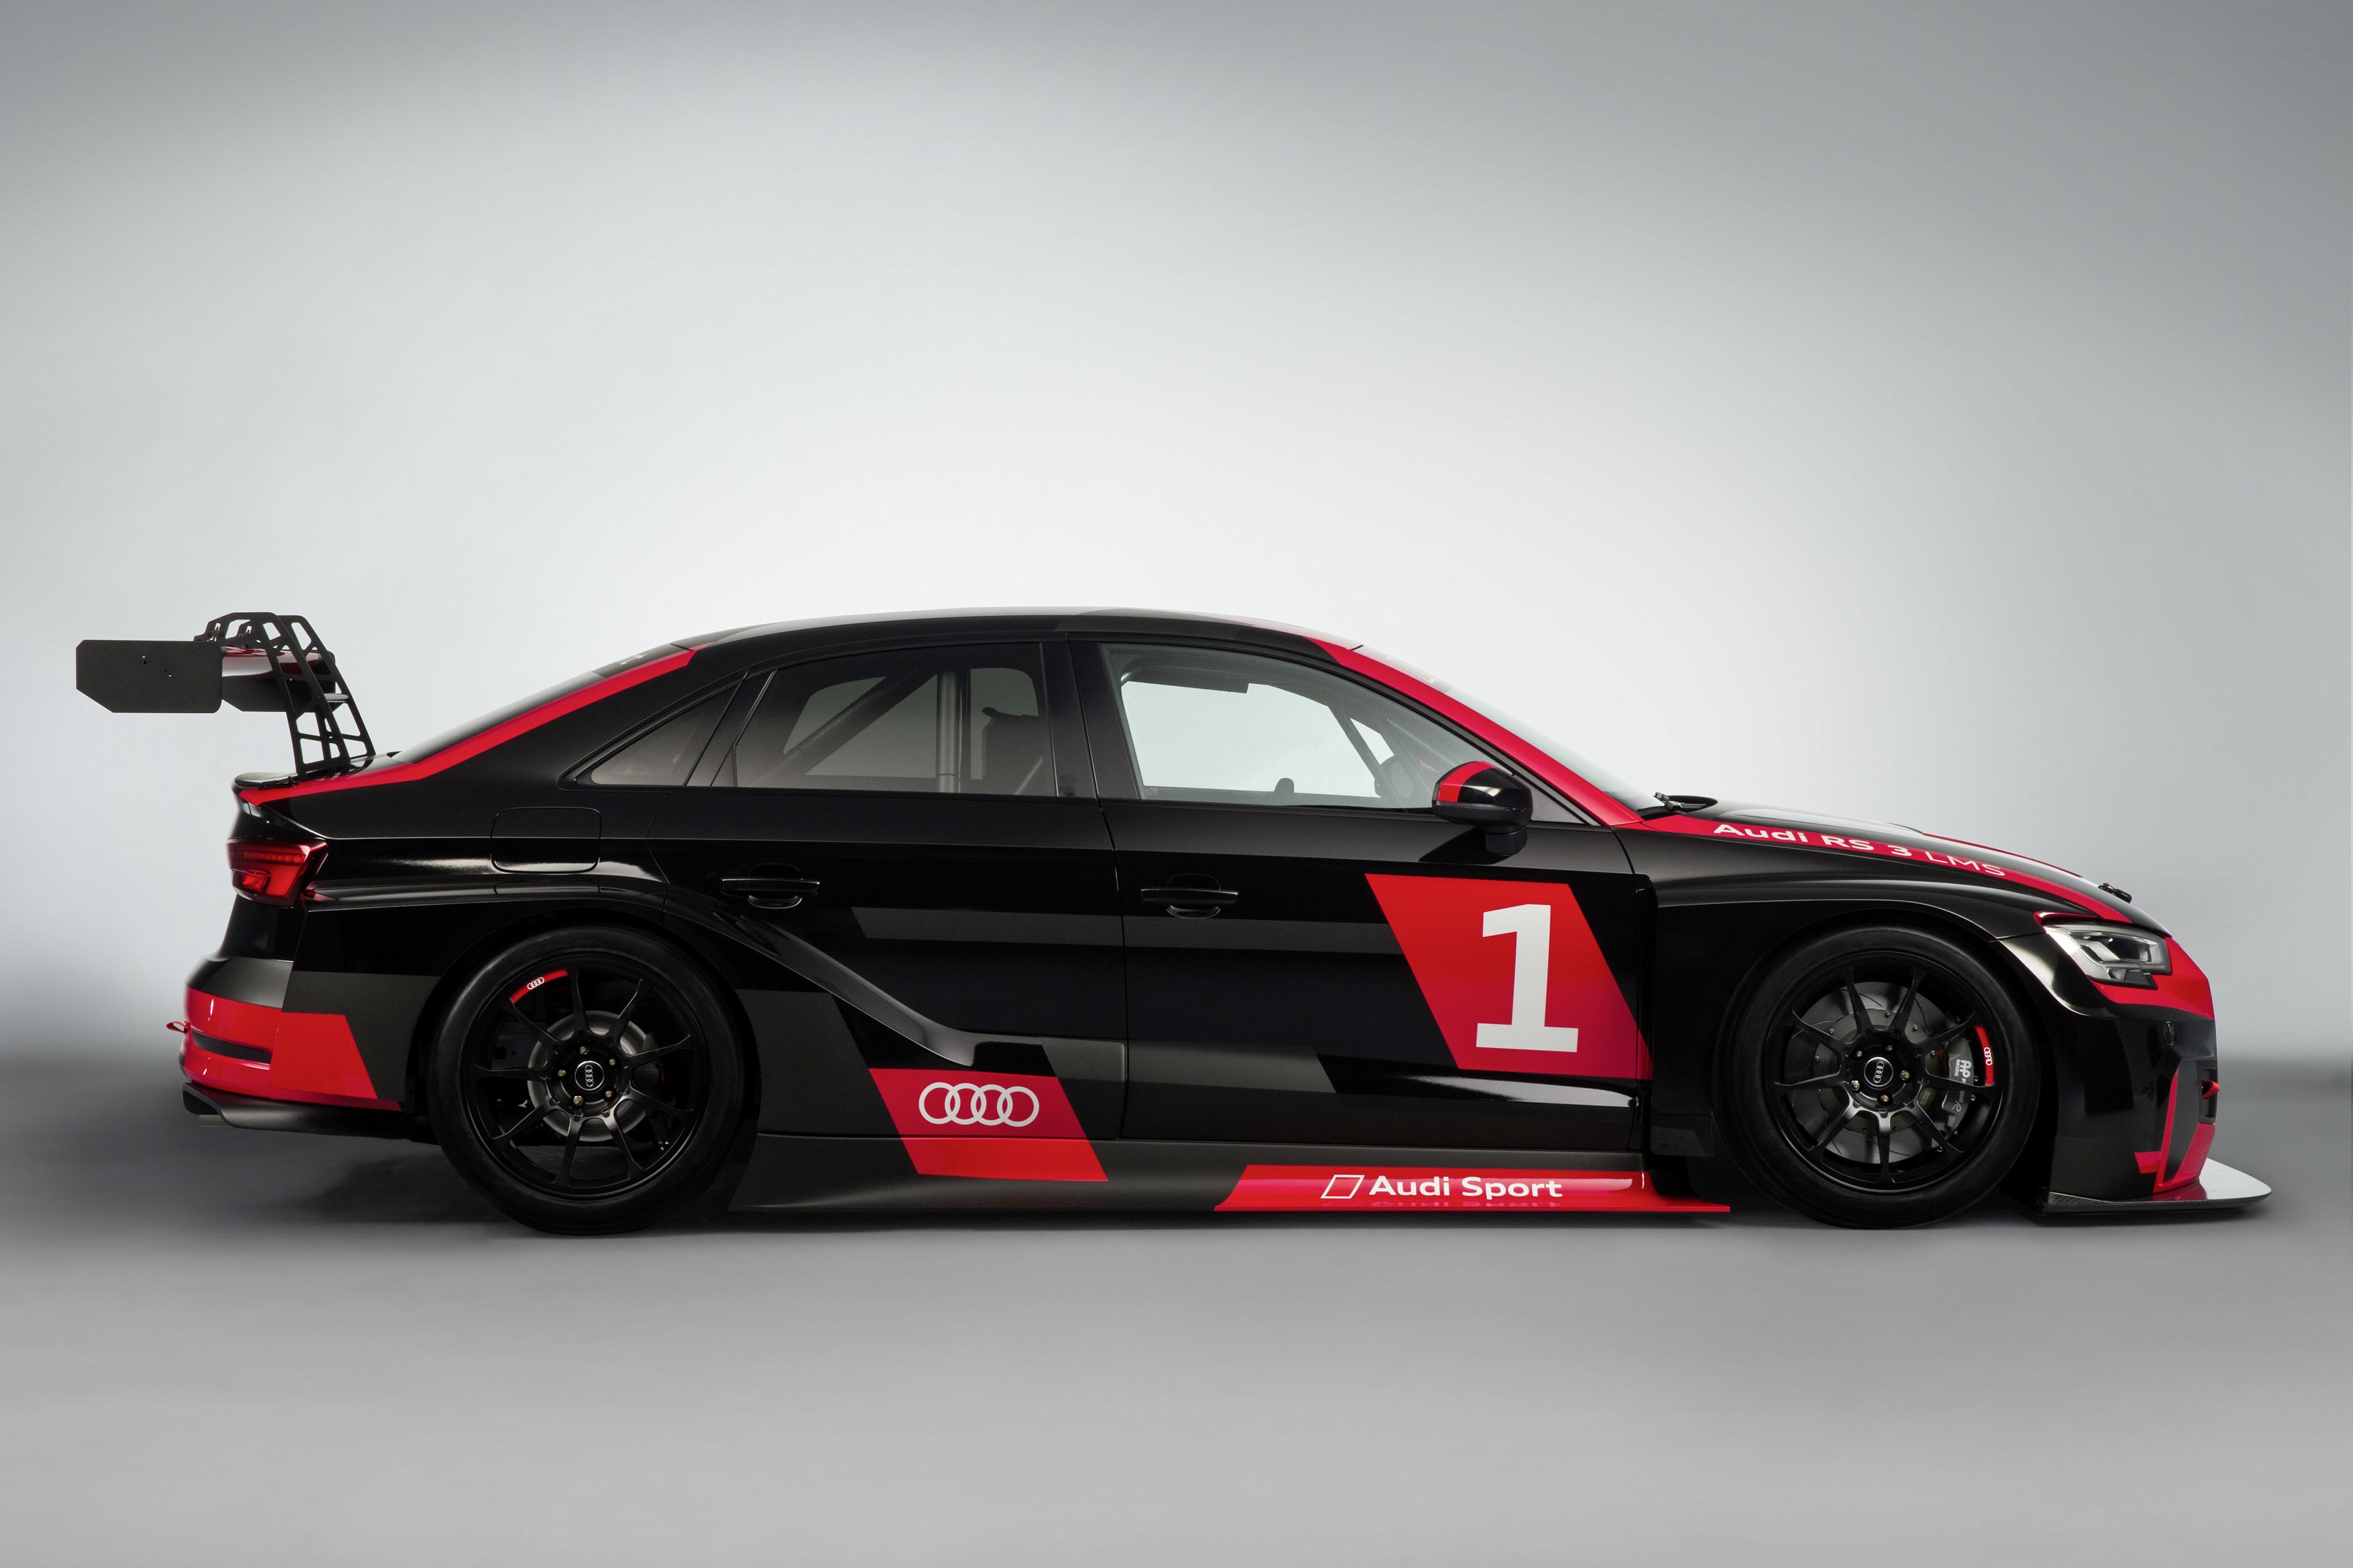 Audi Rs3 4k Ultra Hd Wallpaper Audi Rs3 Race Car 2179154 Hd Wallpaper Backgrounds Download